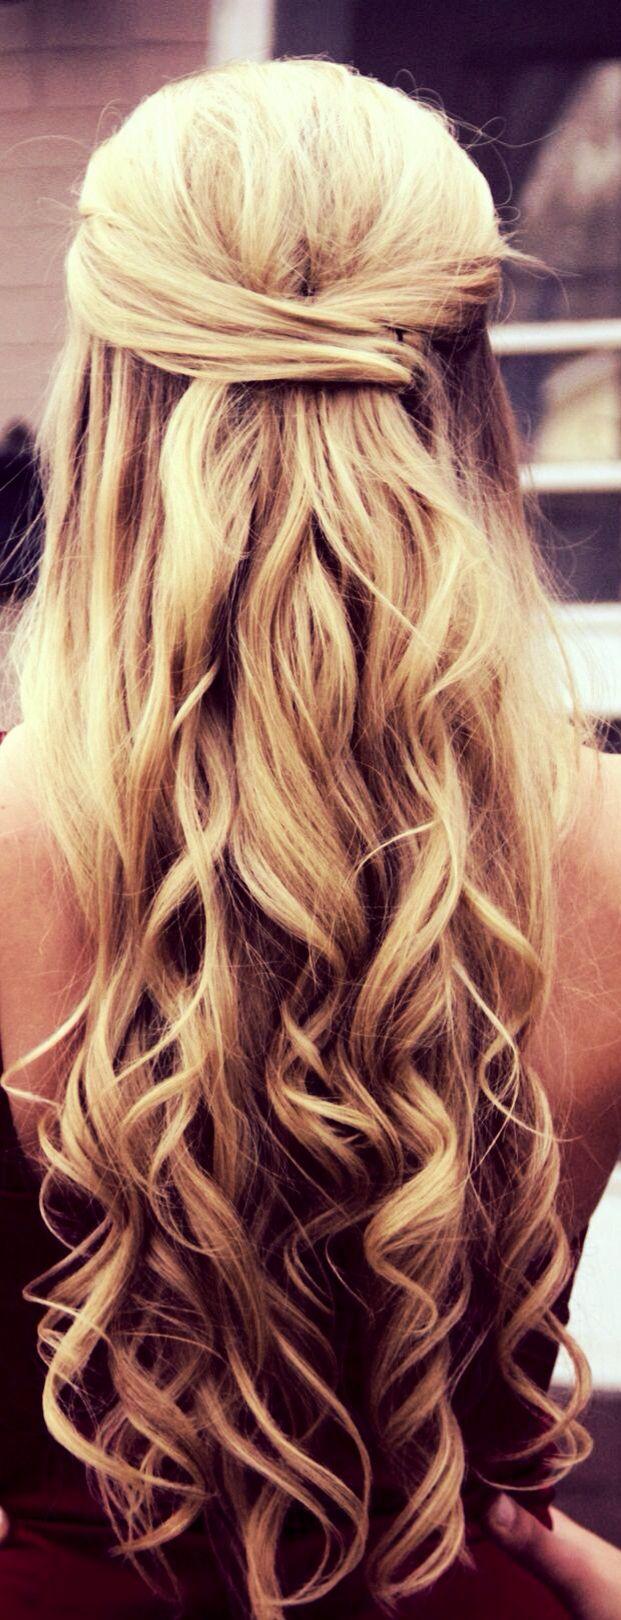 Half up half down curly hair gorgeoushair coiffures pinterest